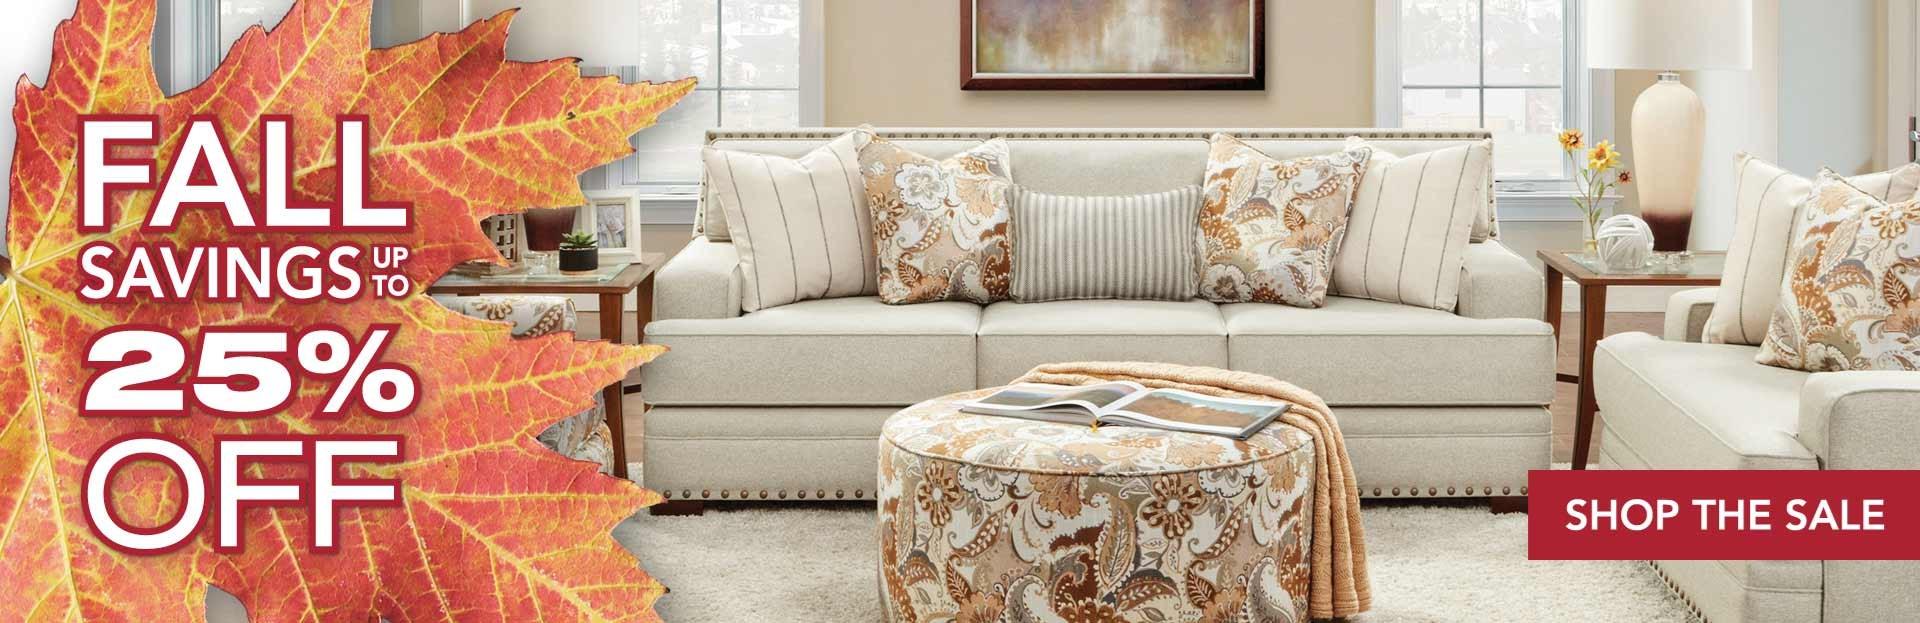 Fall Sale Royal Furniture